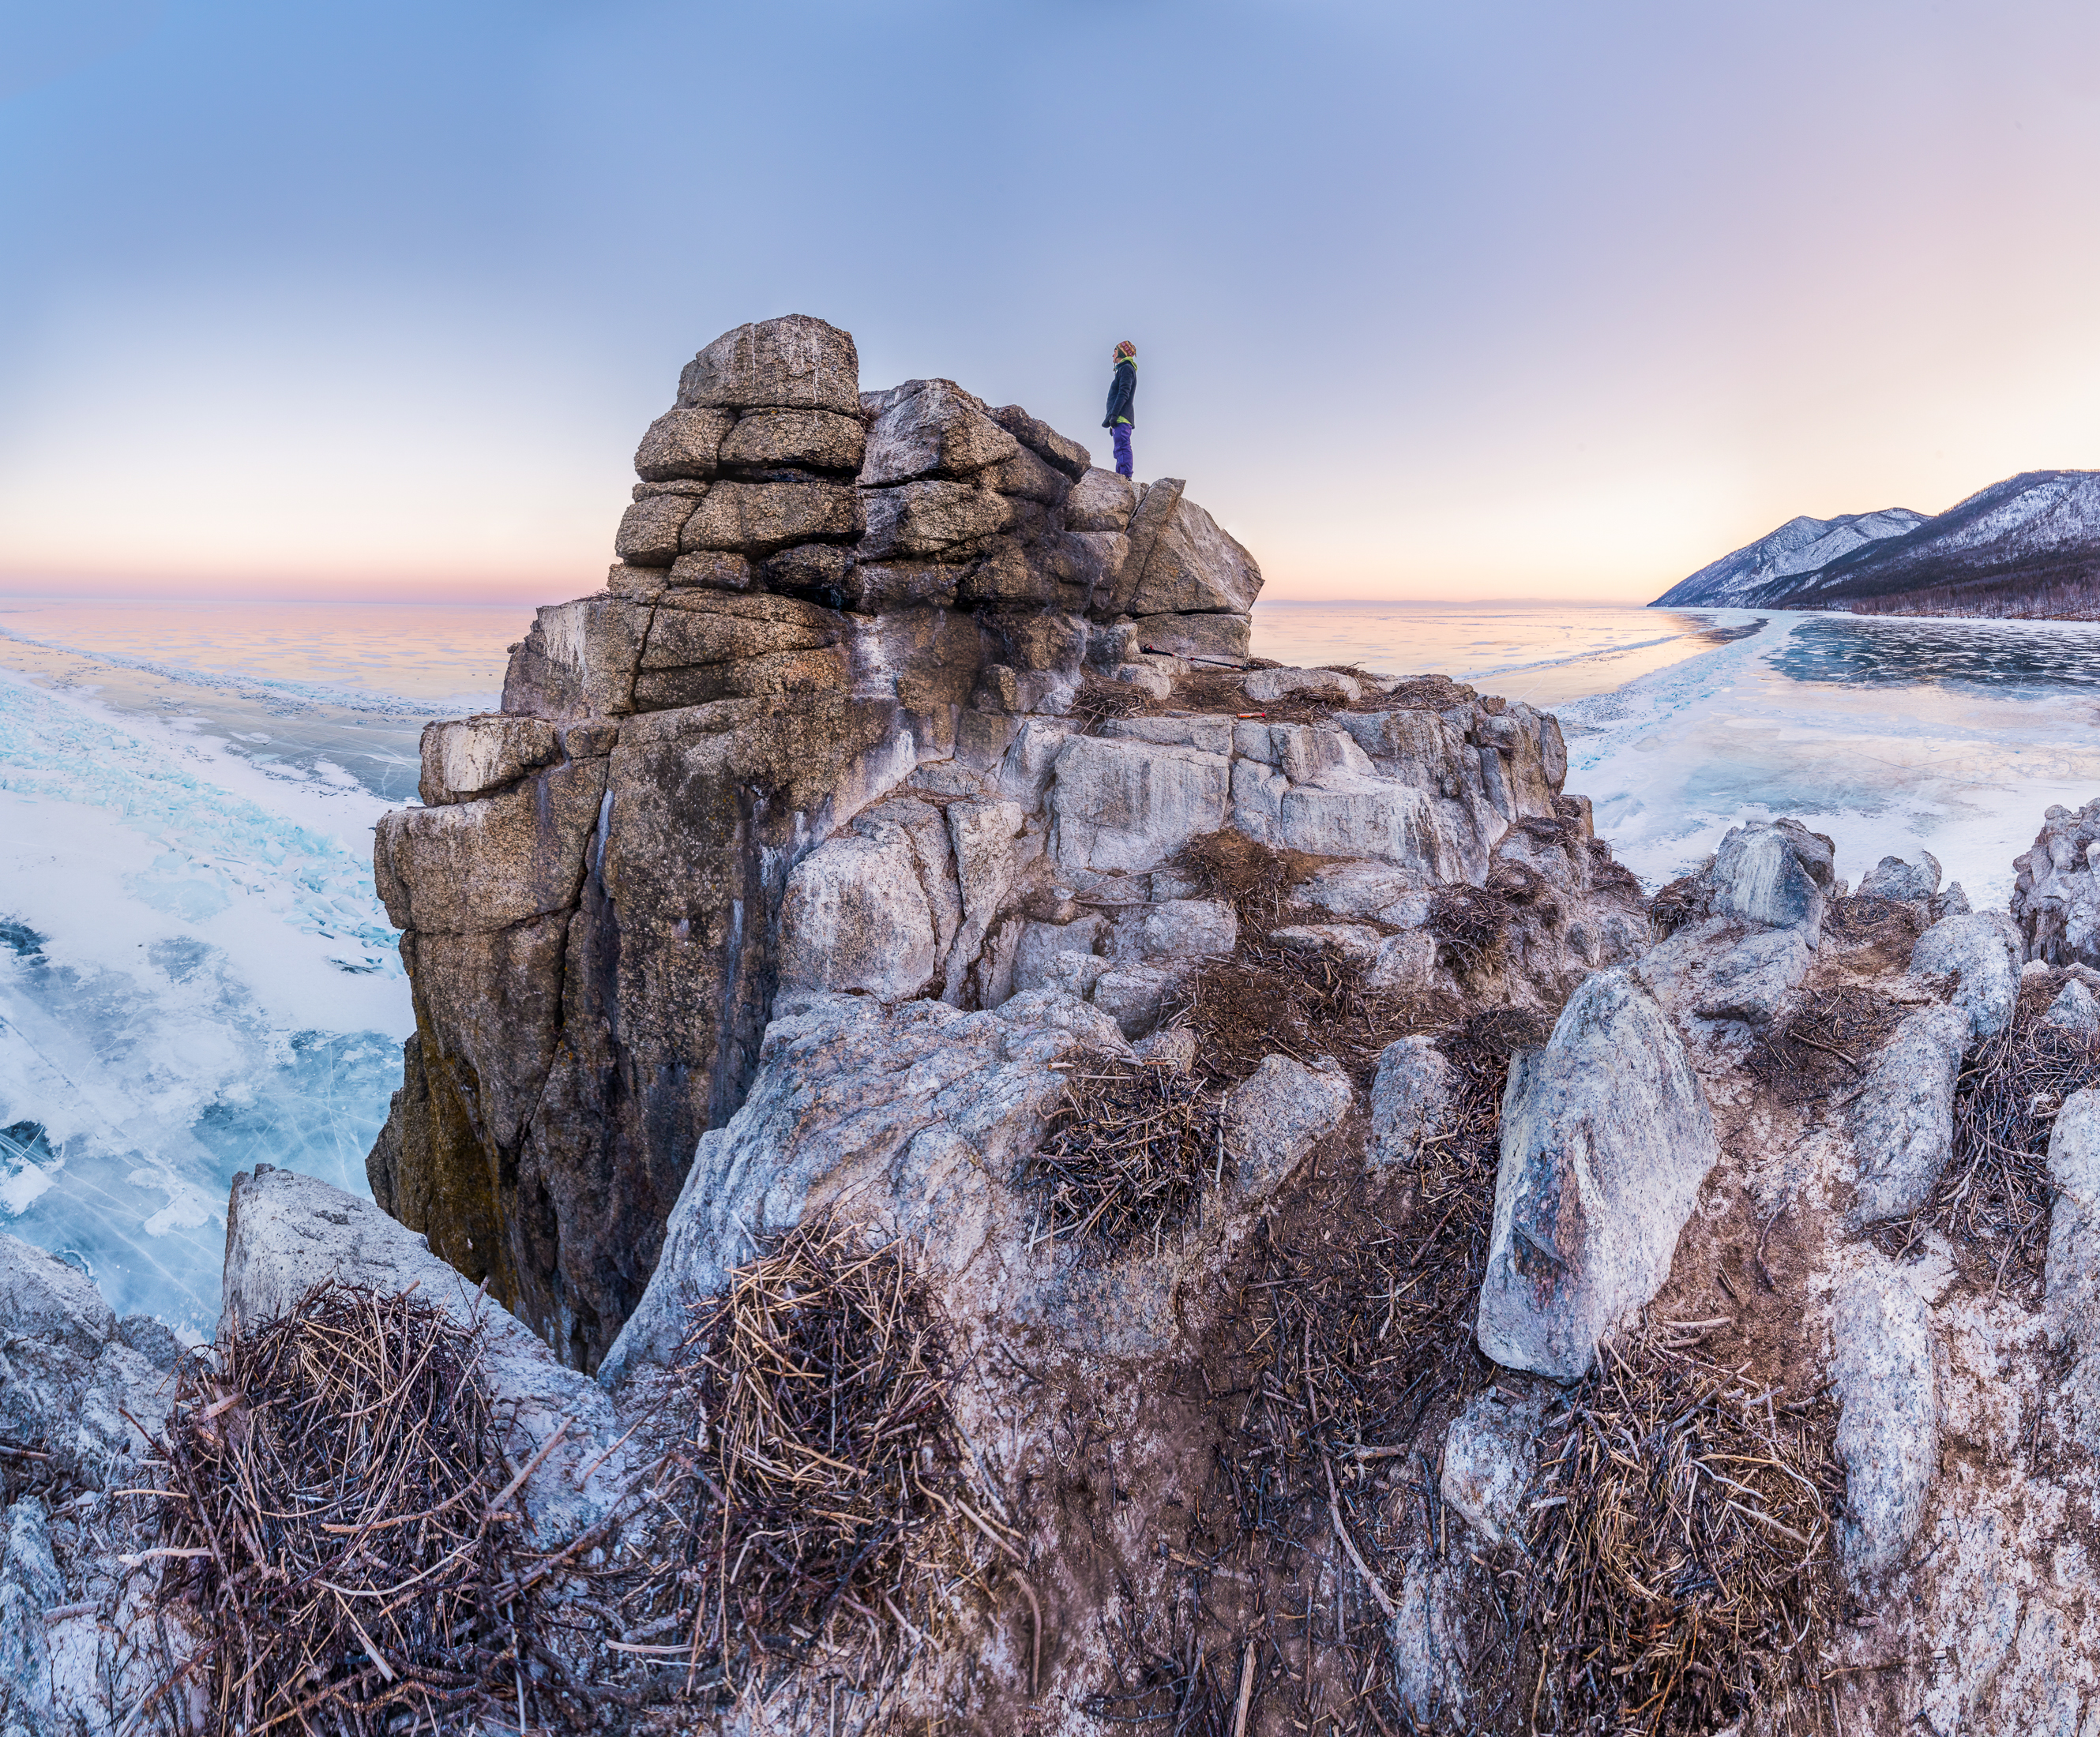 Байкал, бухта песчаная, бакланий камень, скала, лёд, зима, Evgeniy Khilkevitch